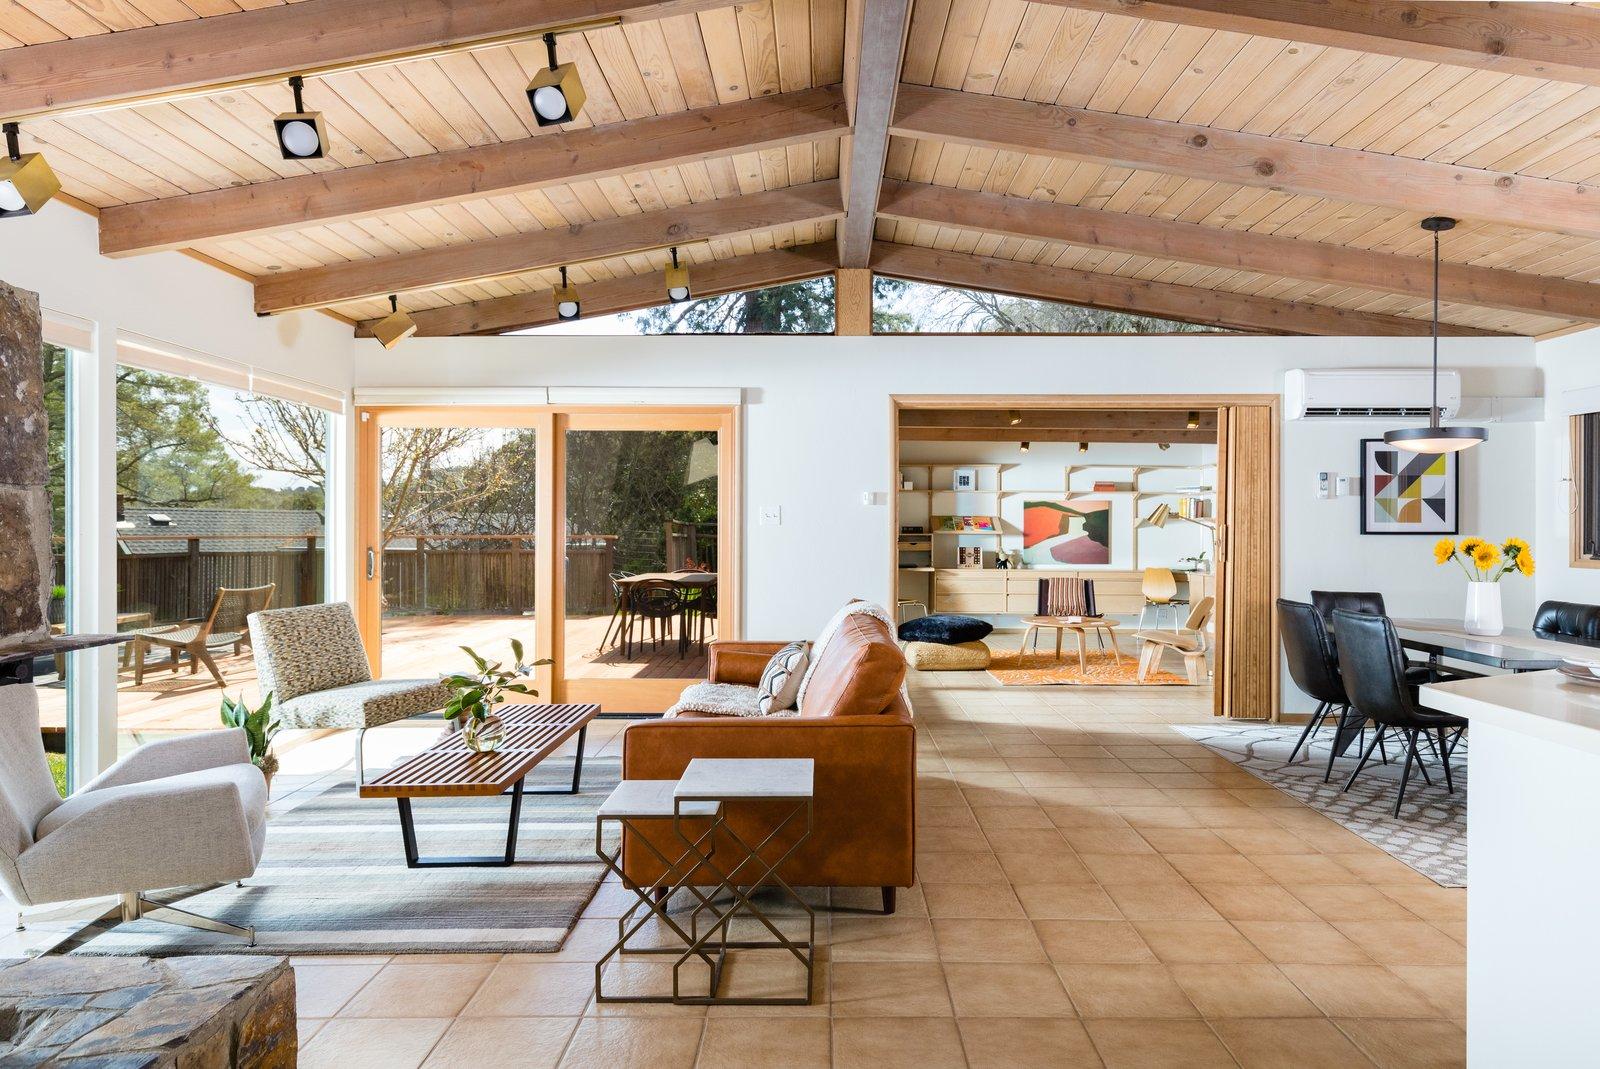 Soak Up Classic Midcentury Vibes in This Orinda Home Asking $1.2M